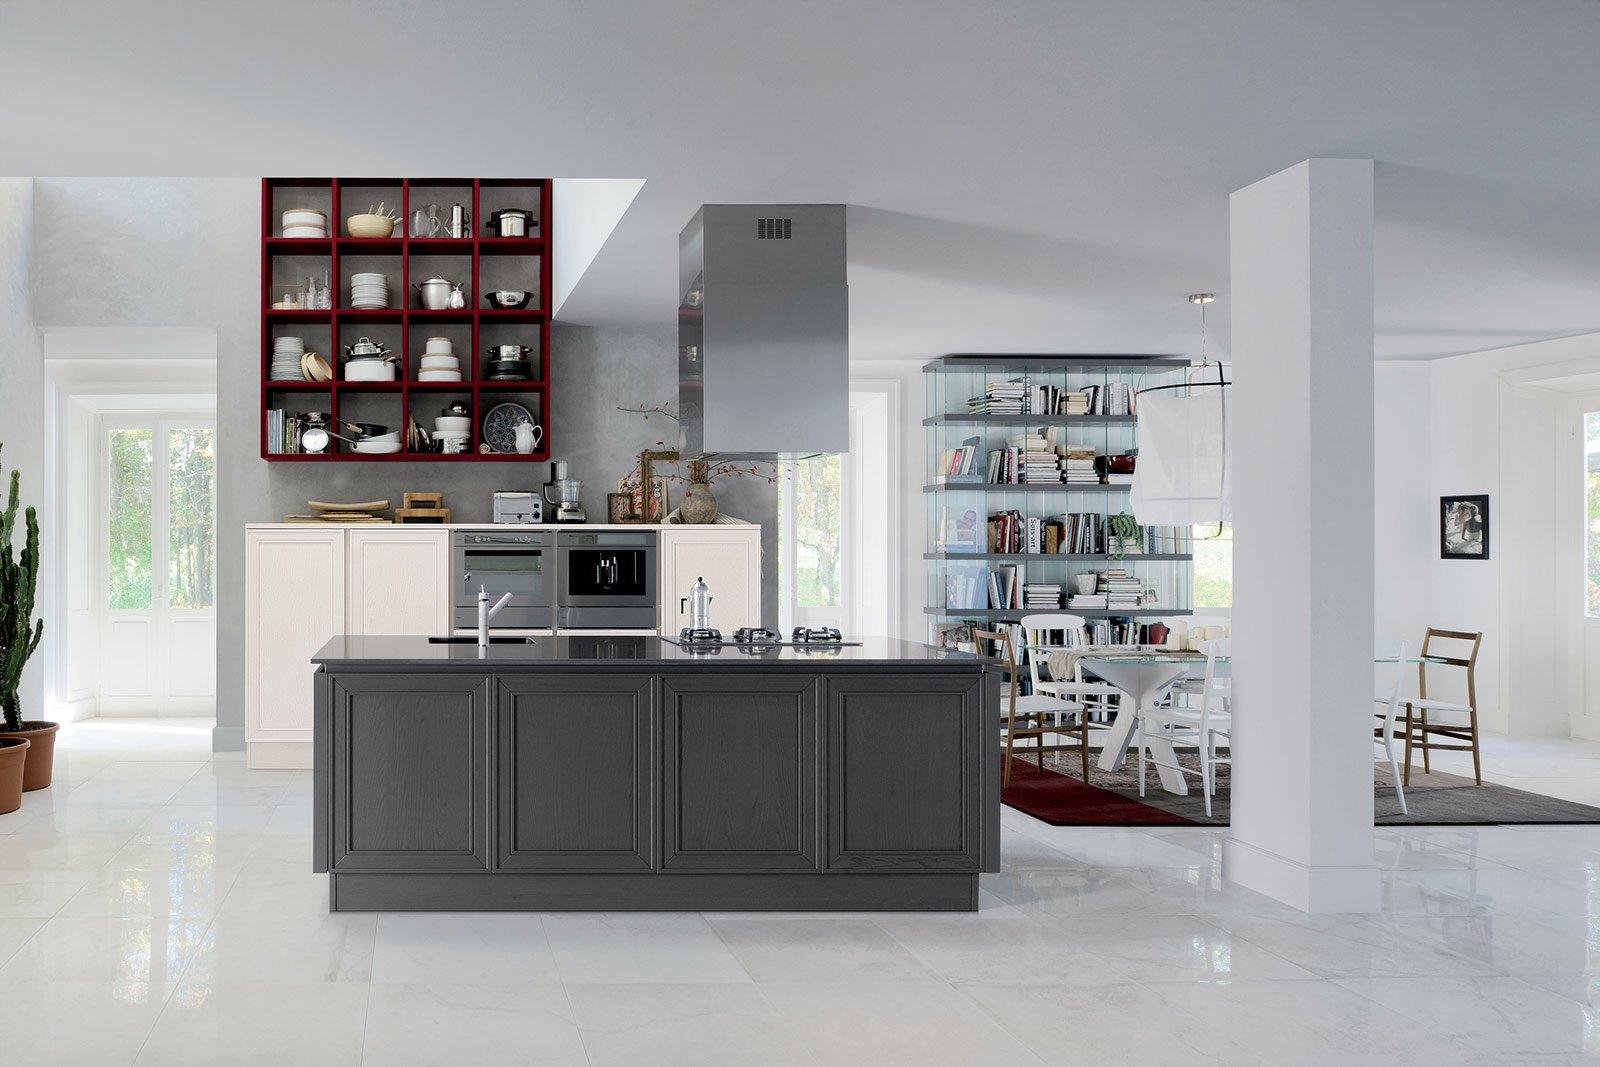 Protagonista Di Elegante Di Veneta Cucine è Il Frassino Laccato  #643834 1600 1067 Aran O Veneta Cucine